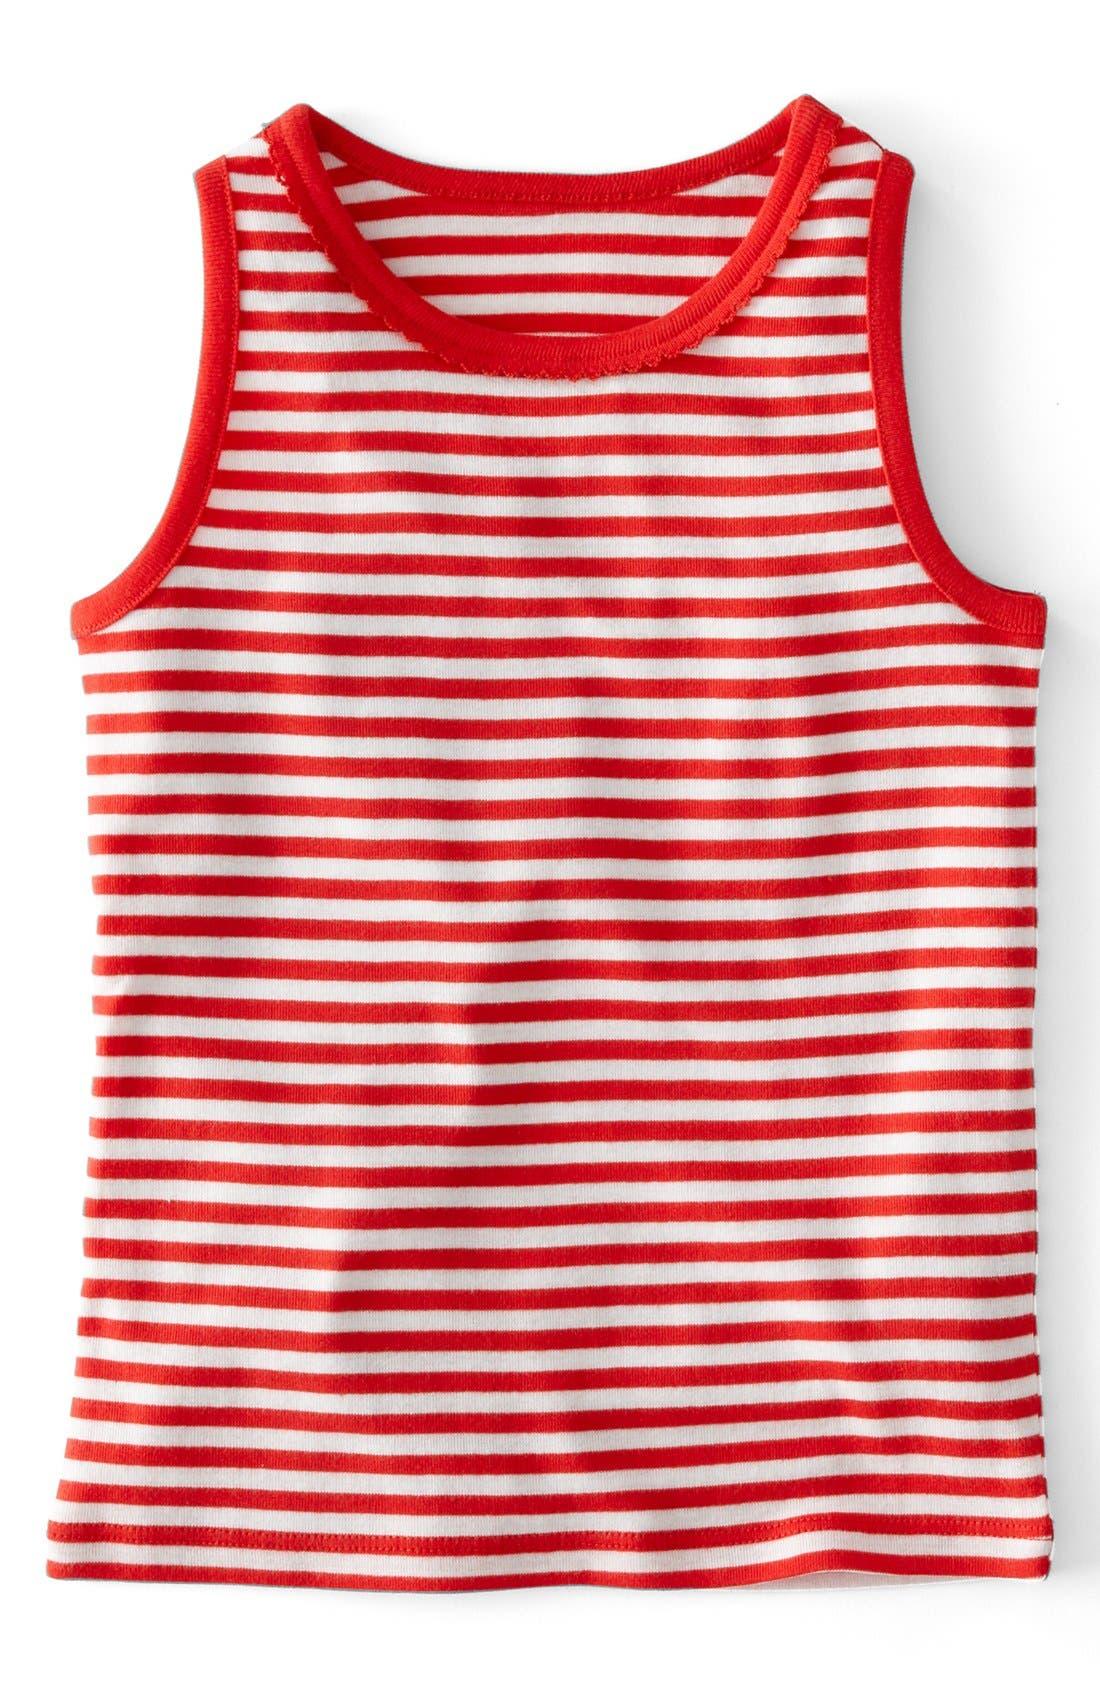 Main Image - Mini Boden Stripe Cotton Top (Toddler Girls, Little Girls & Big Girls)